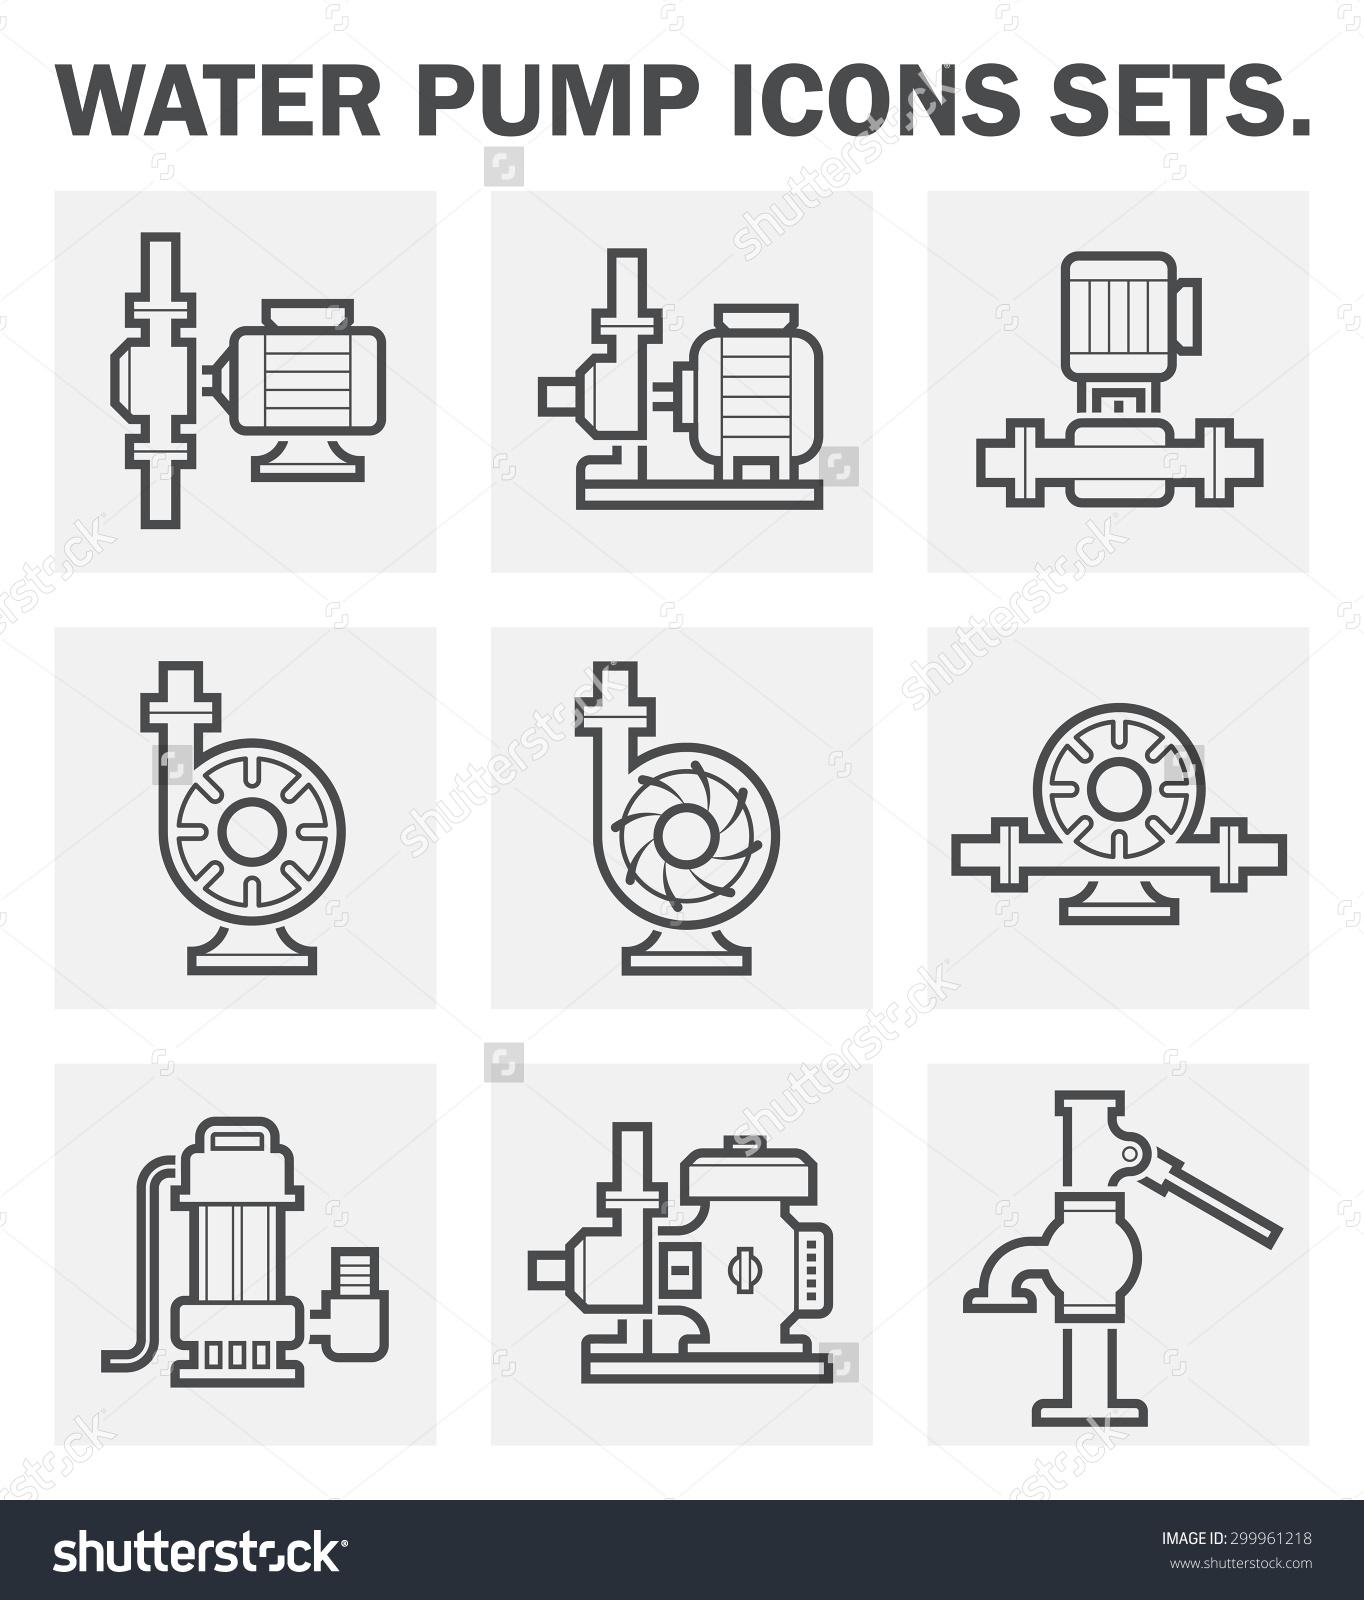 Plumbing pump icon clipart jpg free Vector Icon Electric Water Pump Steel Stock Vector 299961218 ... jpg free